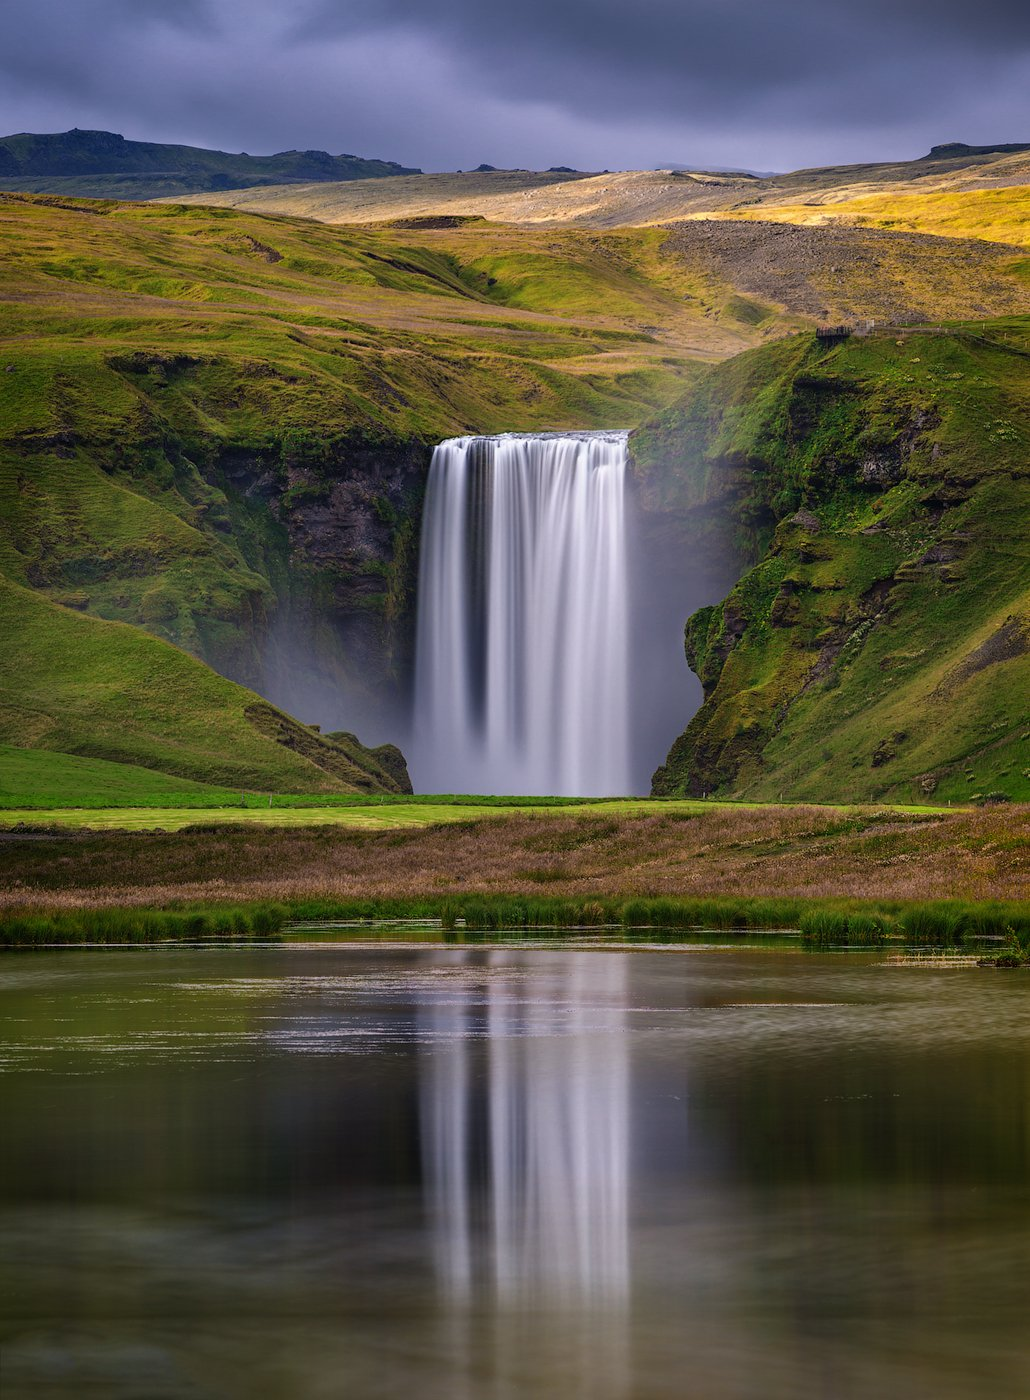 исландия, iceland, skogafoss, водопад, Шевченко Юрий